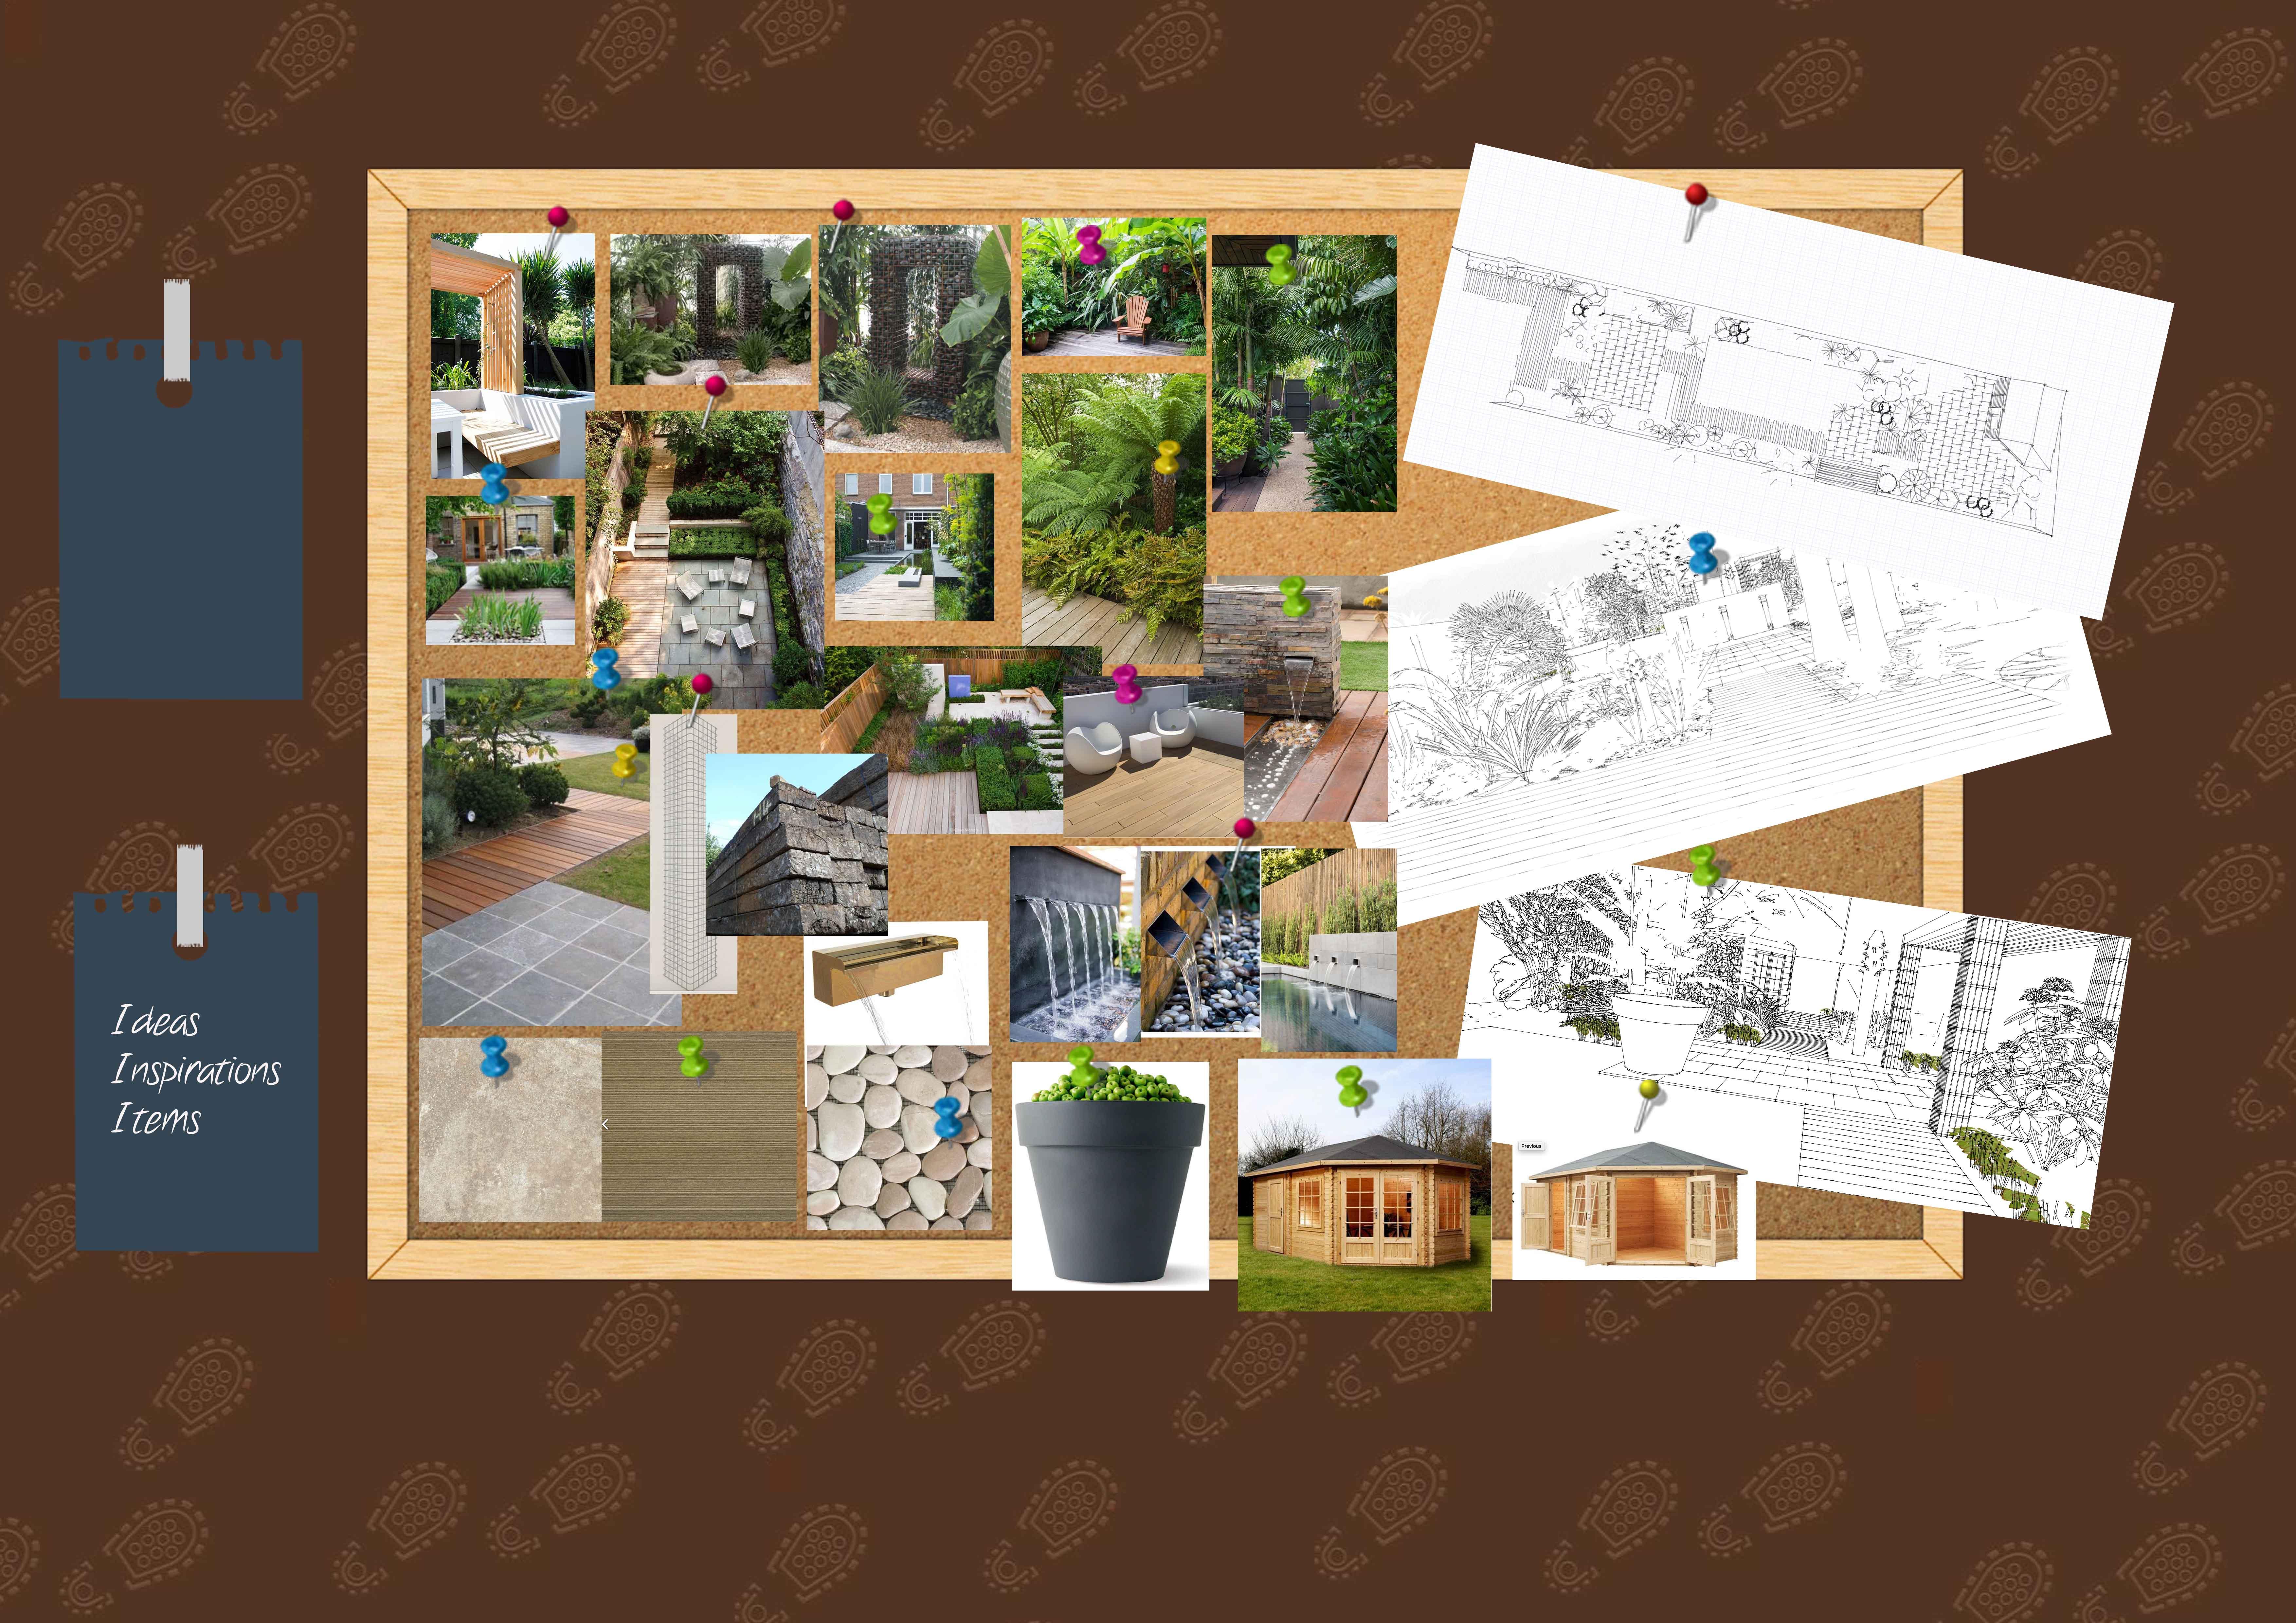 Earth Designs' ideas for garden layout